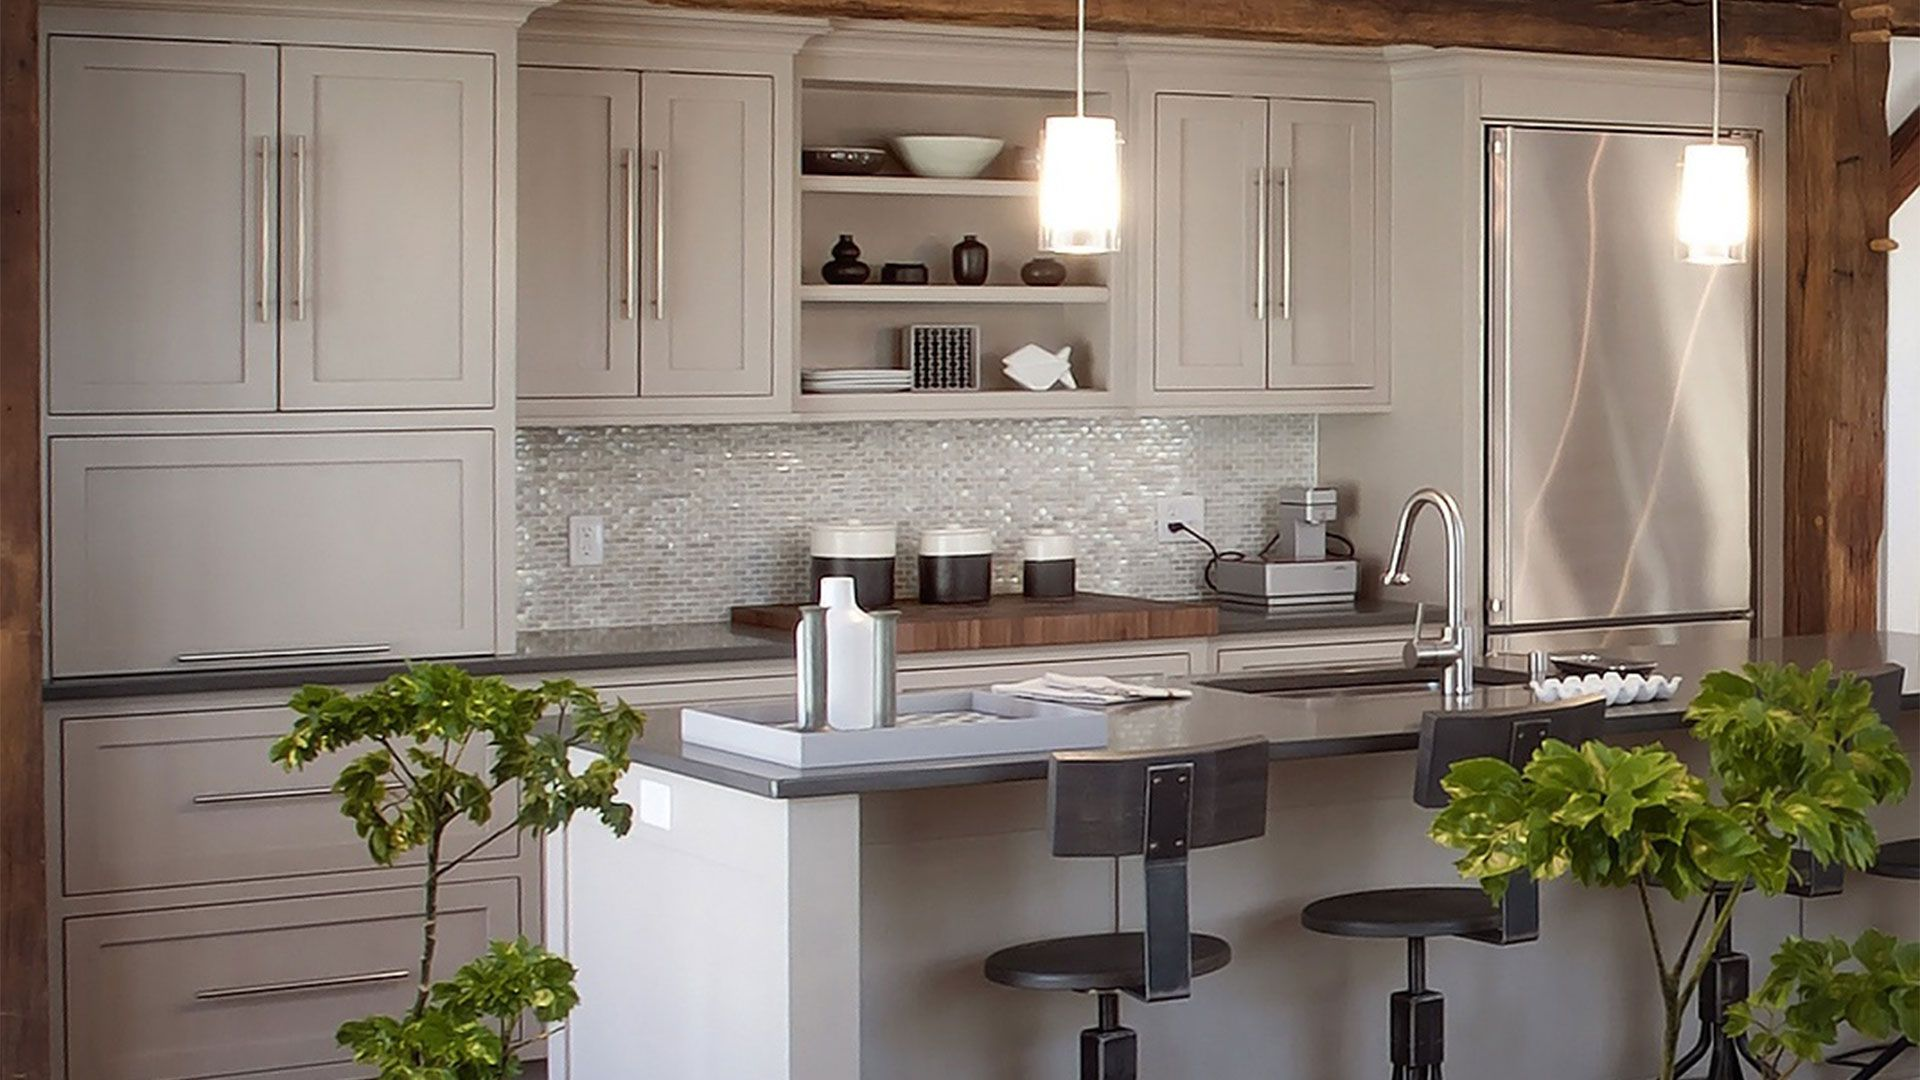 2015 kitchens | ... Glass Tile Backsplash, Latest Design ...